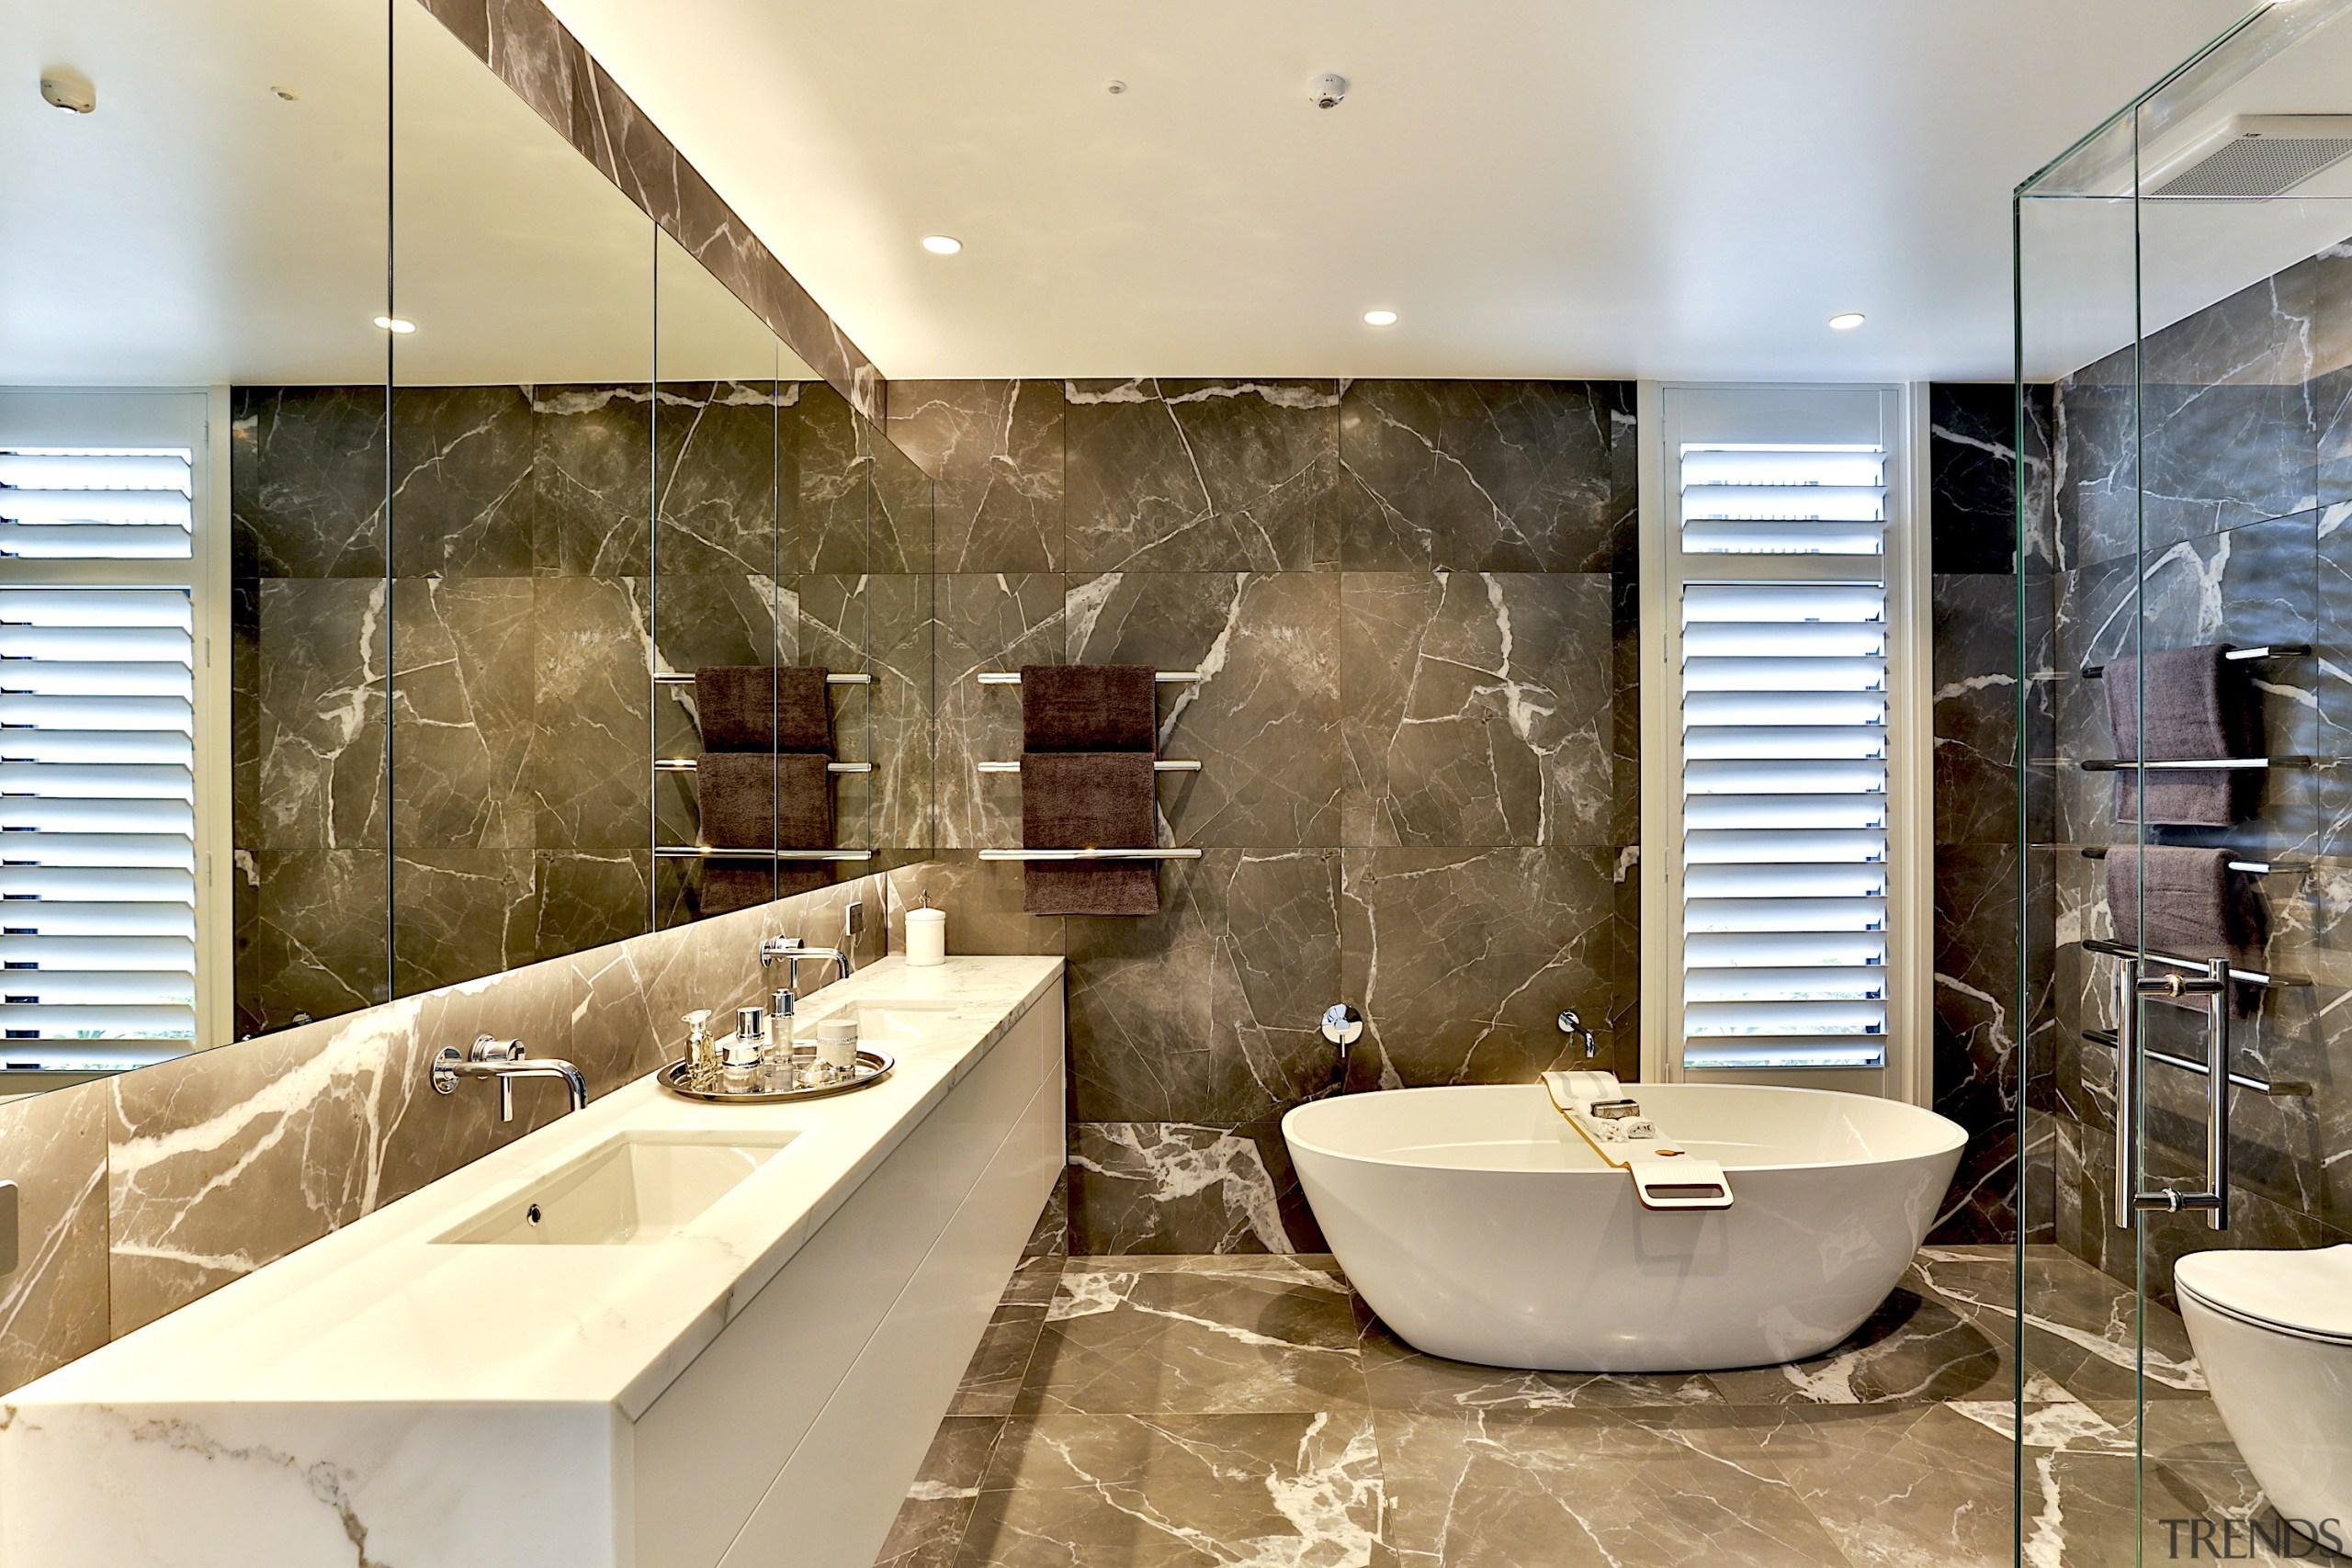 Dunlop Design – Winner – 2019 TIDA New architecture, bathroom, bathtub, building, ceiling, design, floor, flooring, furniture, home, house, interior design, marble, plumbing fixture, property, real estate, room, tap, tile, wall, orange, brown